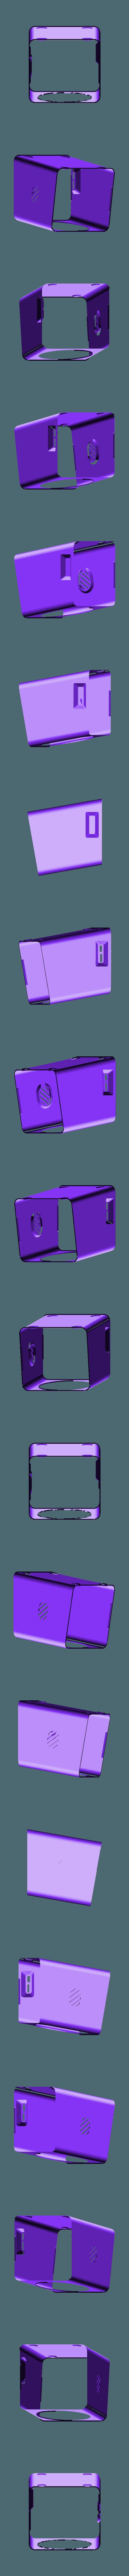 pyplant-frame.stl Download free STL file IOT Smart Pet Planter • Template to 3D print, Adafruit